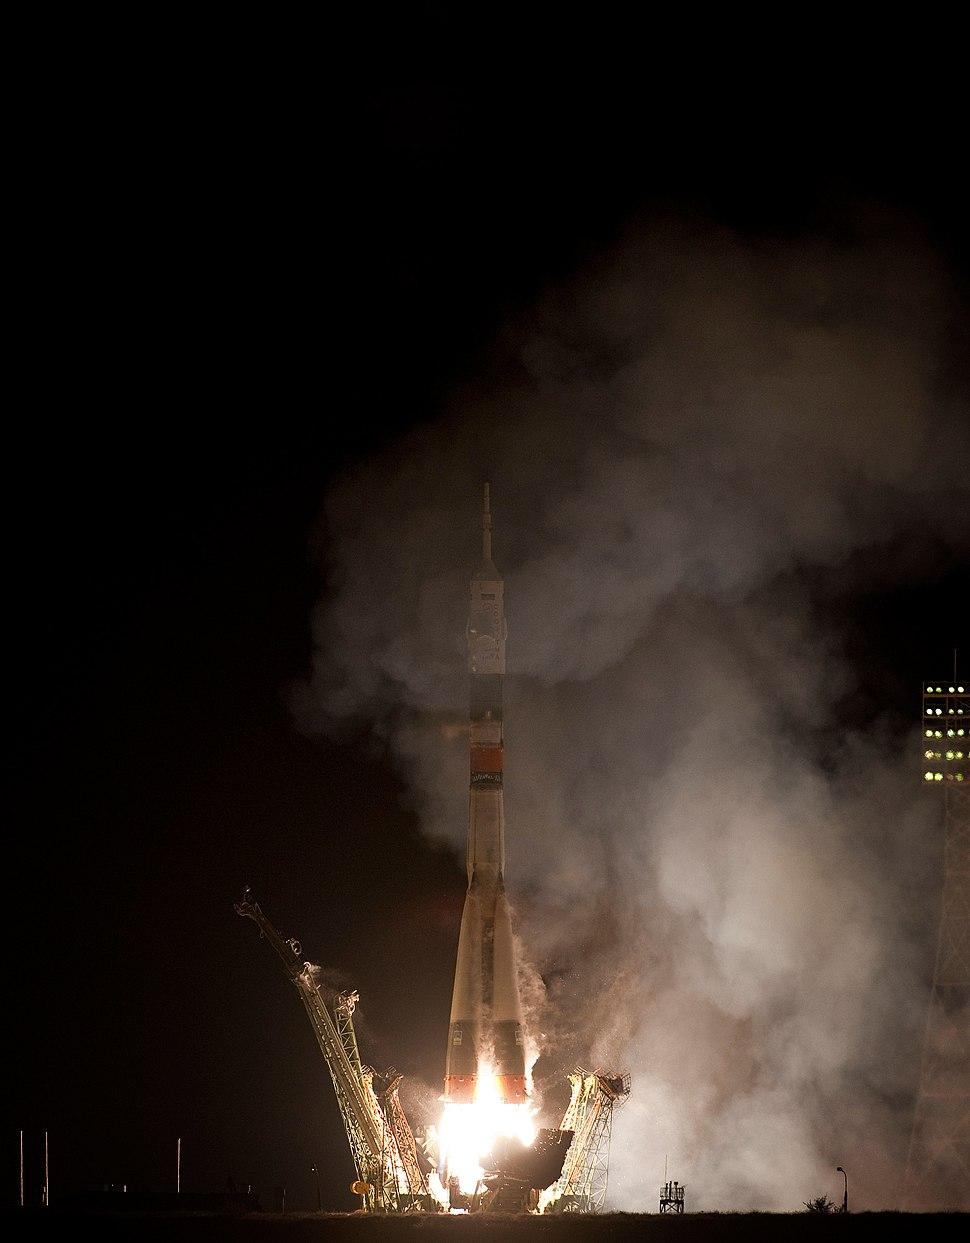 Soyuz TMA-01M launch